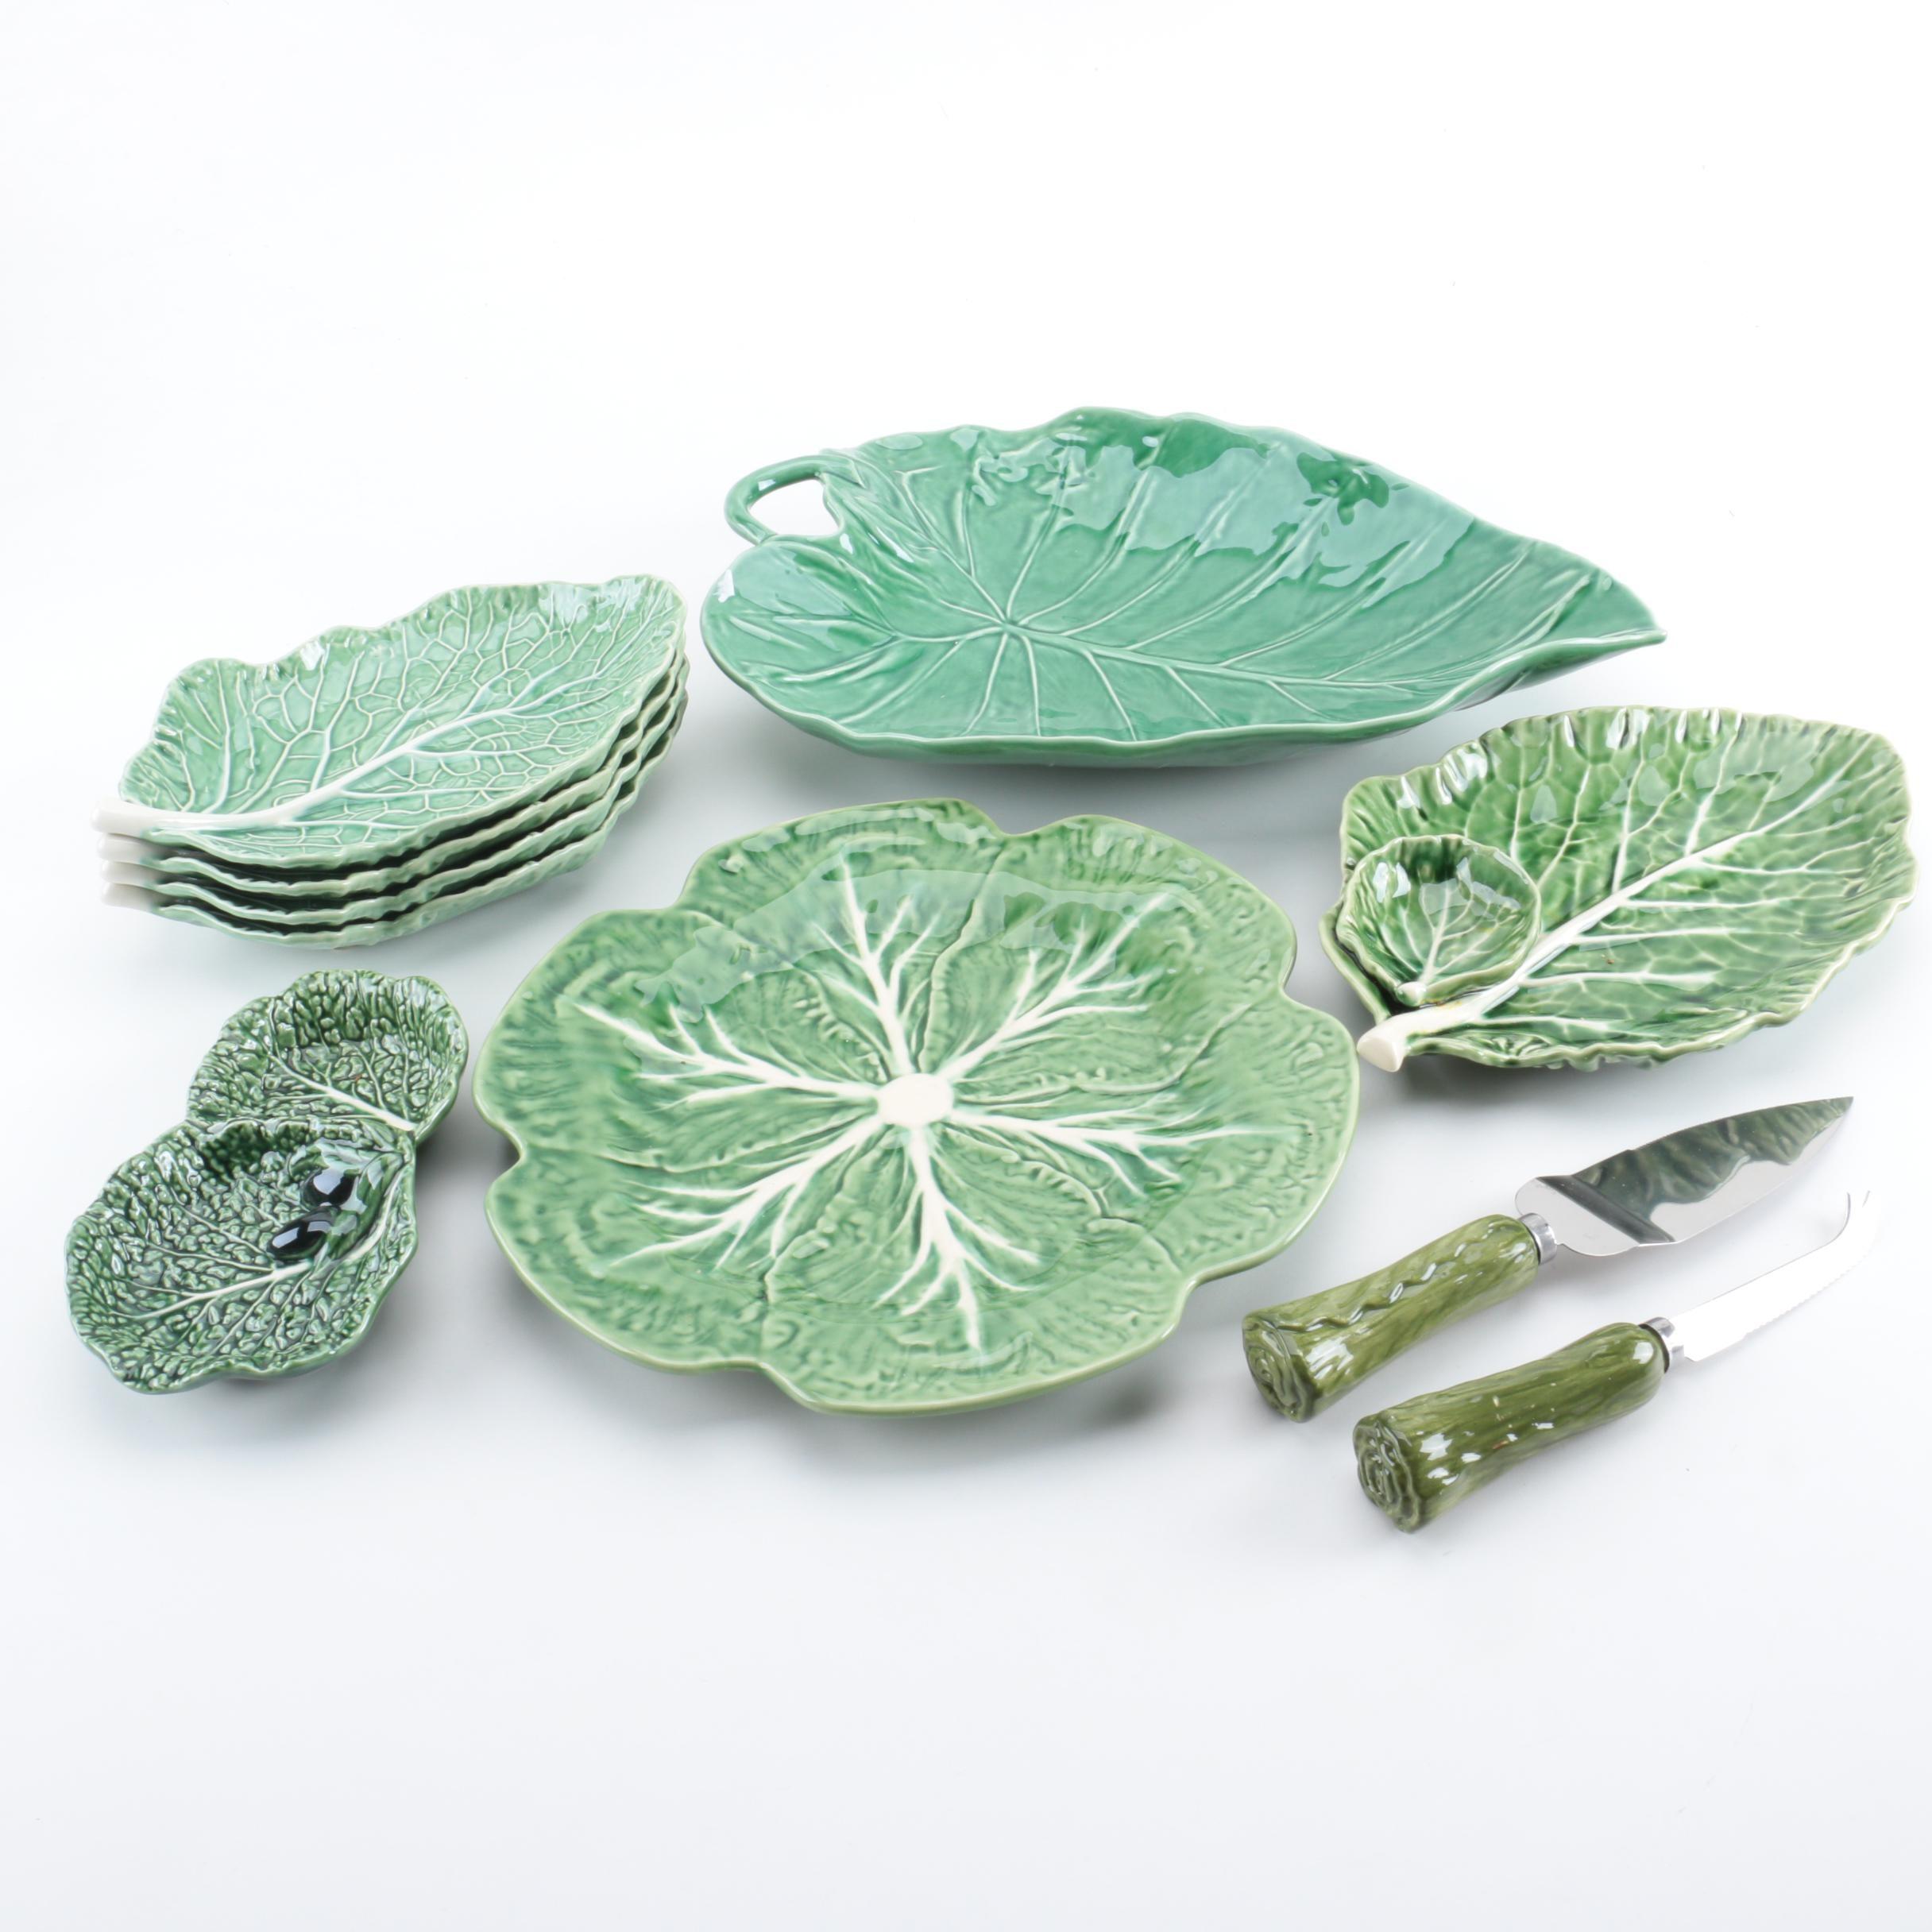 Bordallo Pinheiro Majolica Cabbage Leaf Dinnerware ...  sc 1 st  EBTH.com & Bordallo Pinheiro Majolica Cabbage Leaf Dinnerware : EBTH